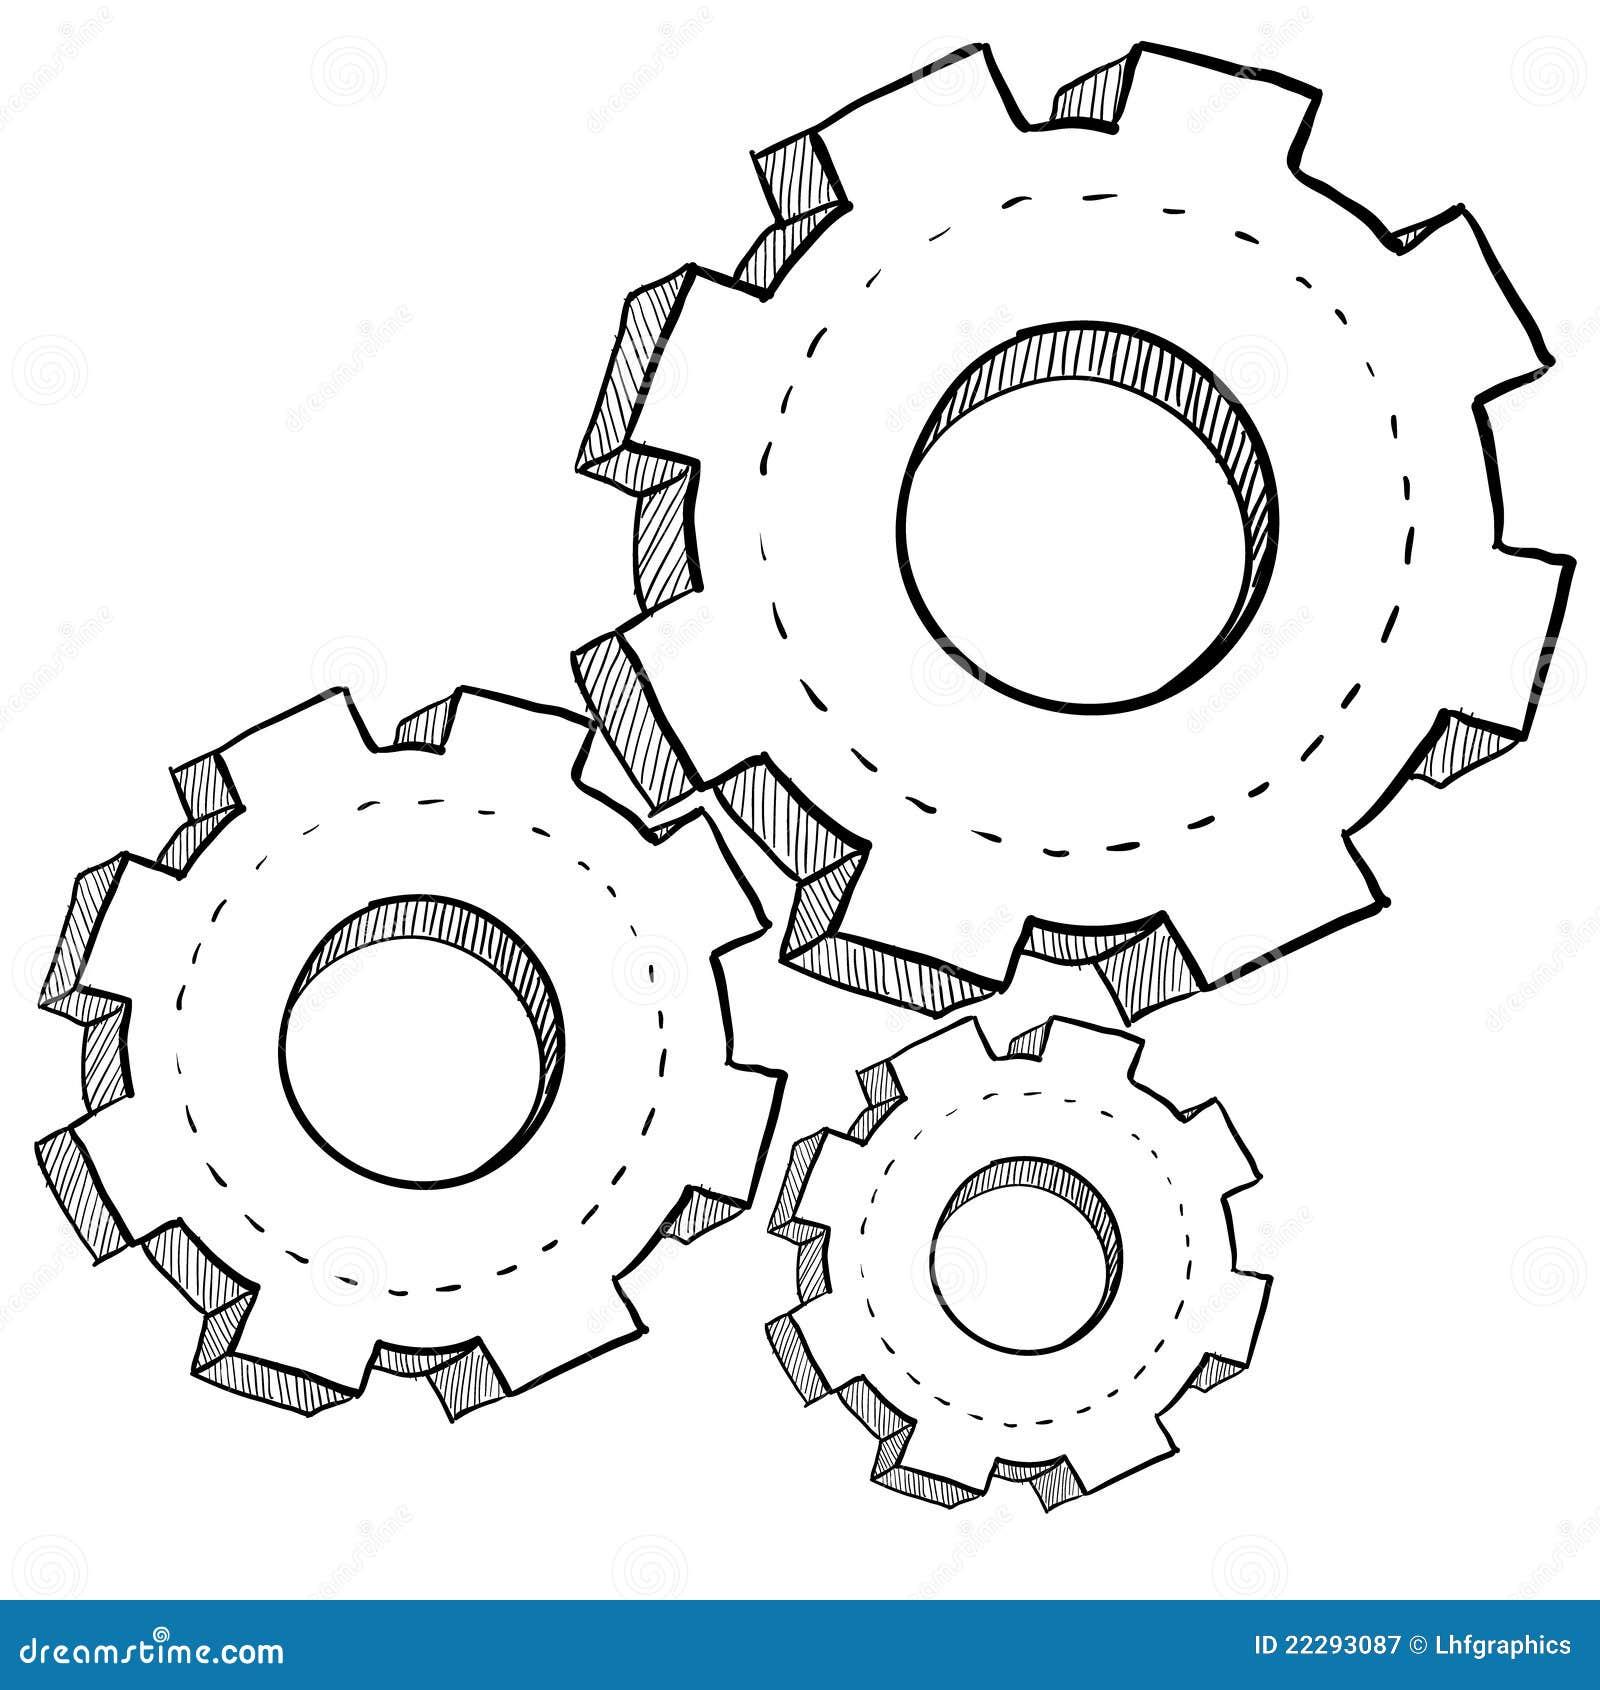 Fotografia De Stock Royalty Free Engrenagem Mec C3 A2nicos Ou Ilustra C3 A7 C3 A3o Dos Ajustes Image22293087 moreover Glossary 20  20balance 20assembly additionally Engineer Mechanical Design additionally Spaceshuttle together with . on mechanical clock diagram